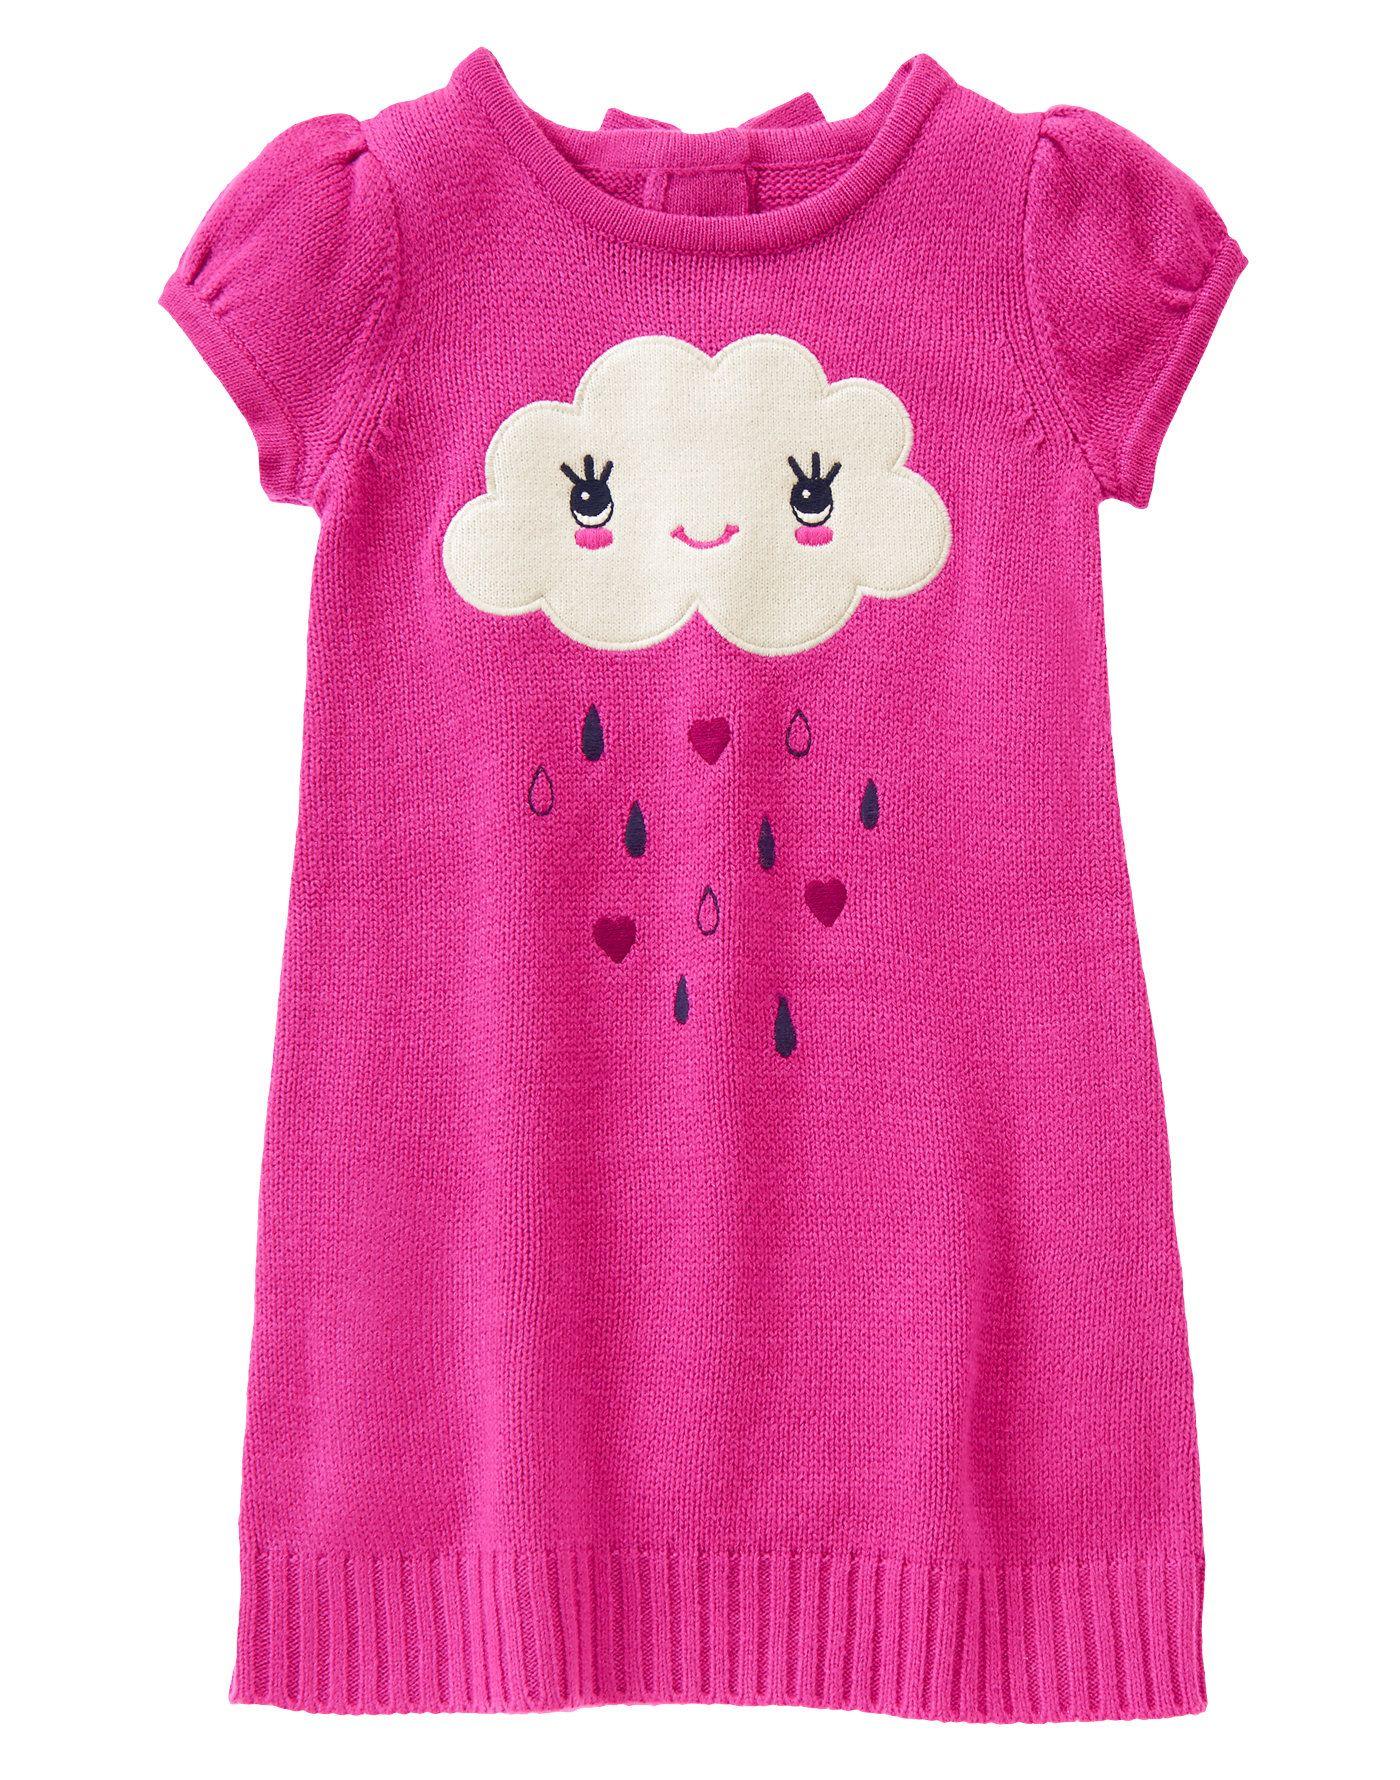 NWT Gymboree Loveable Lamb Sweater Dress Girls 9 12mo Baby Girls